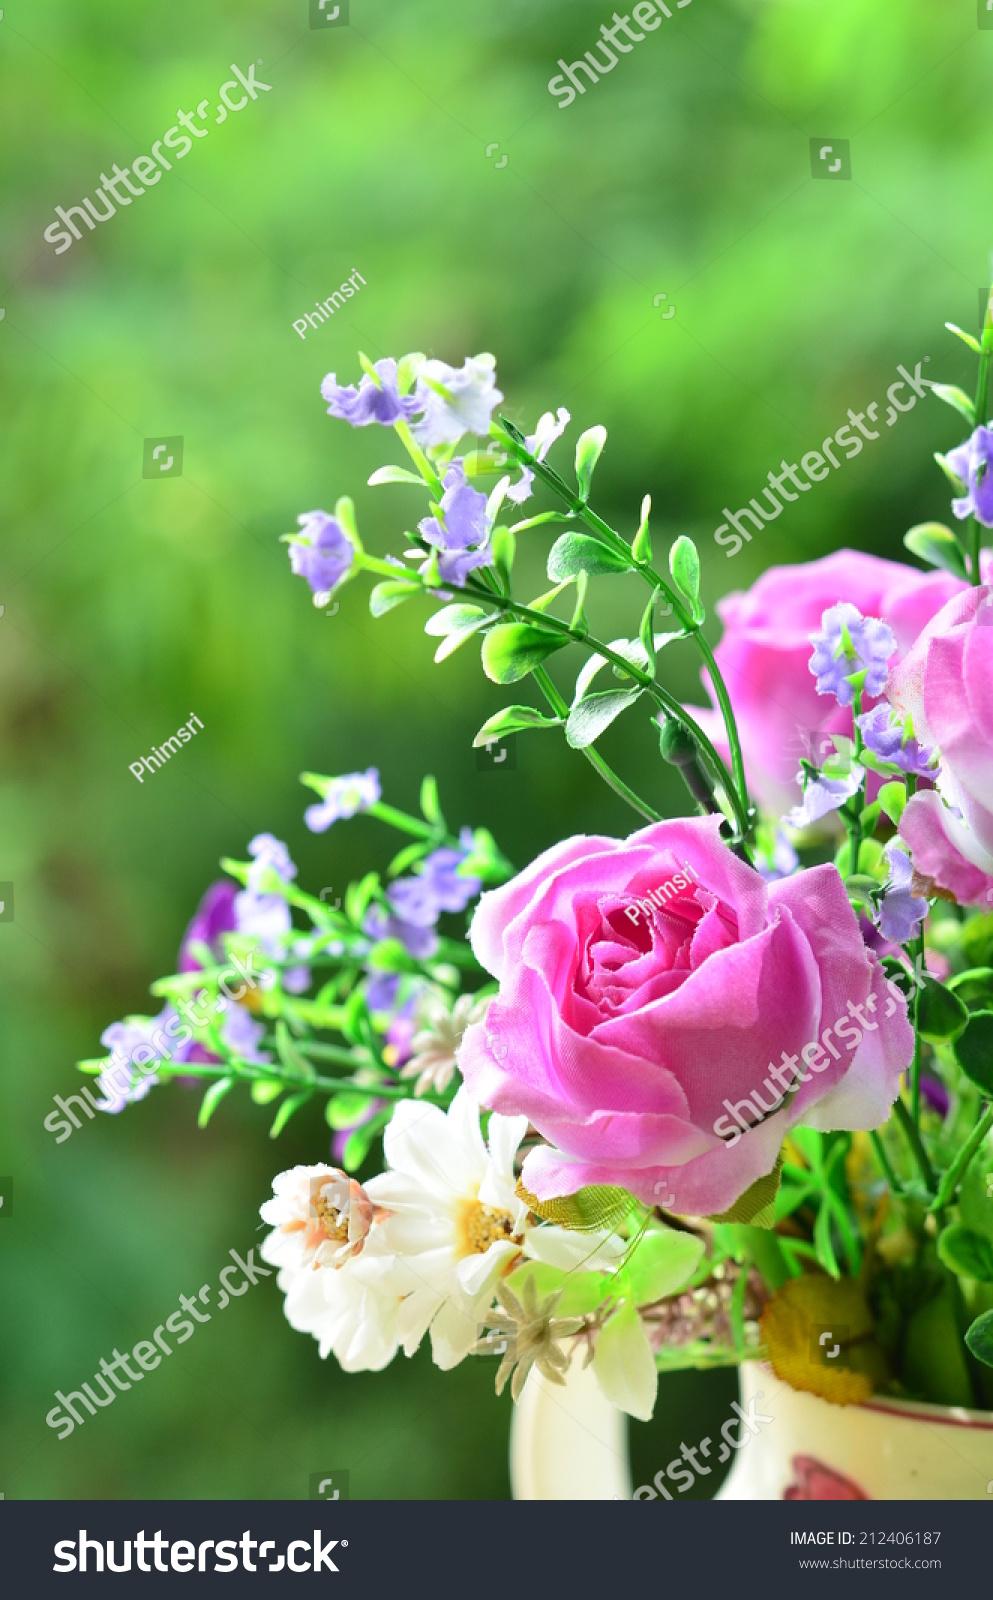 Good Morning Garden Images